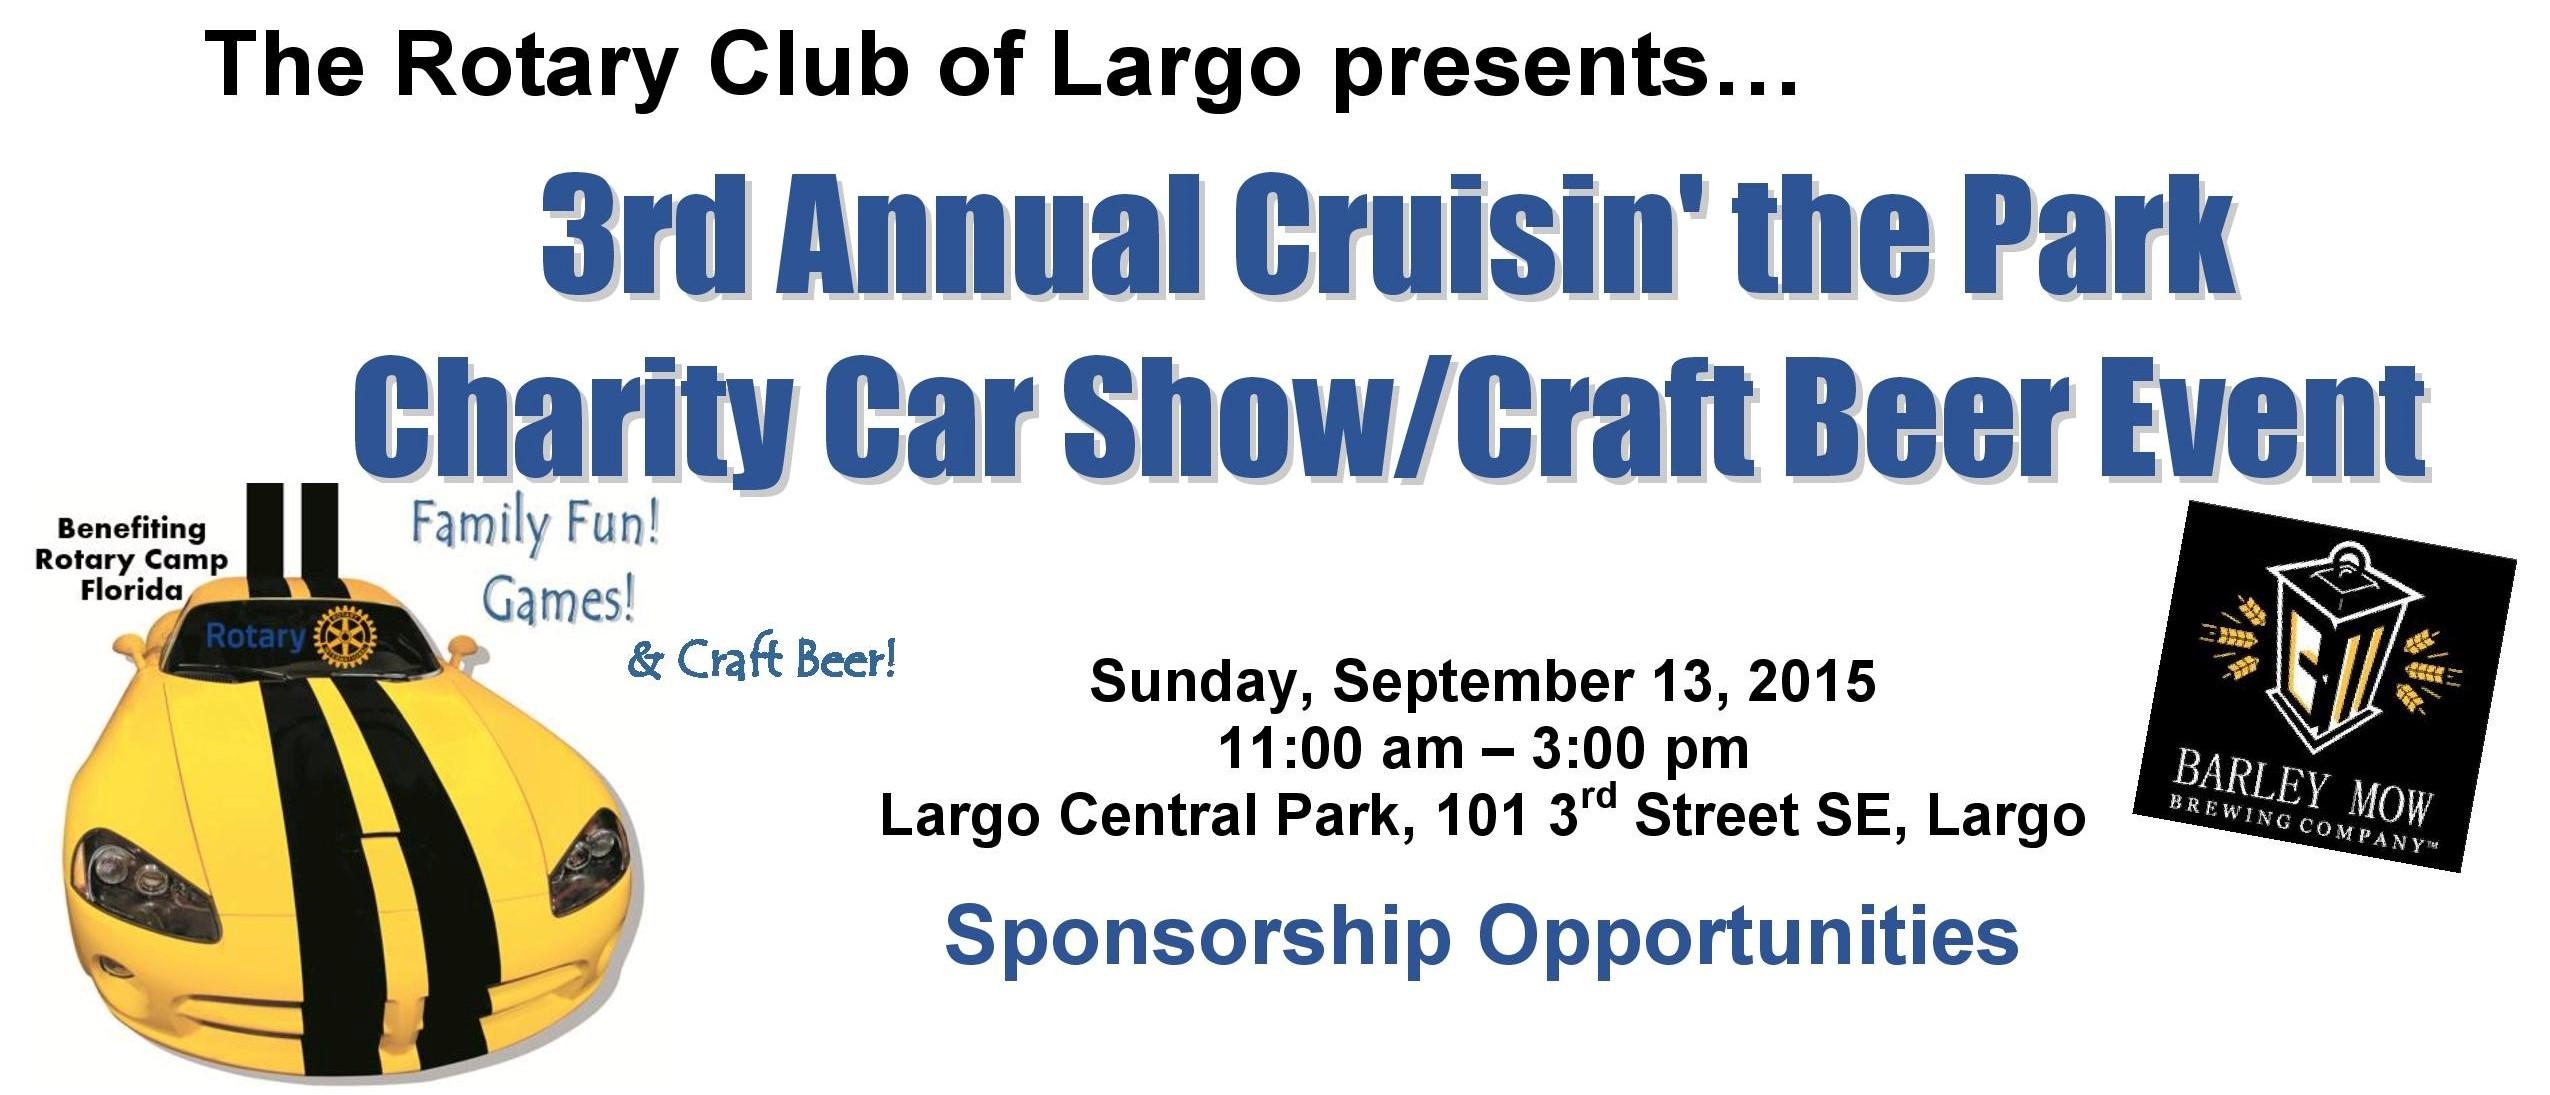 Car-Show-2015-Sponsorship-page-001-3